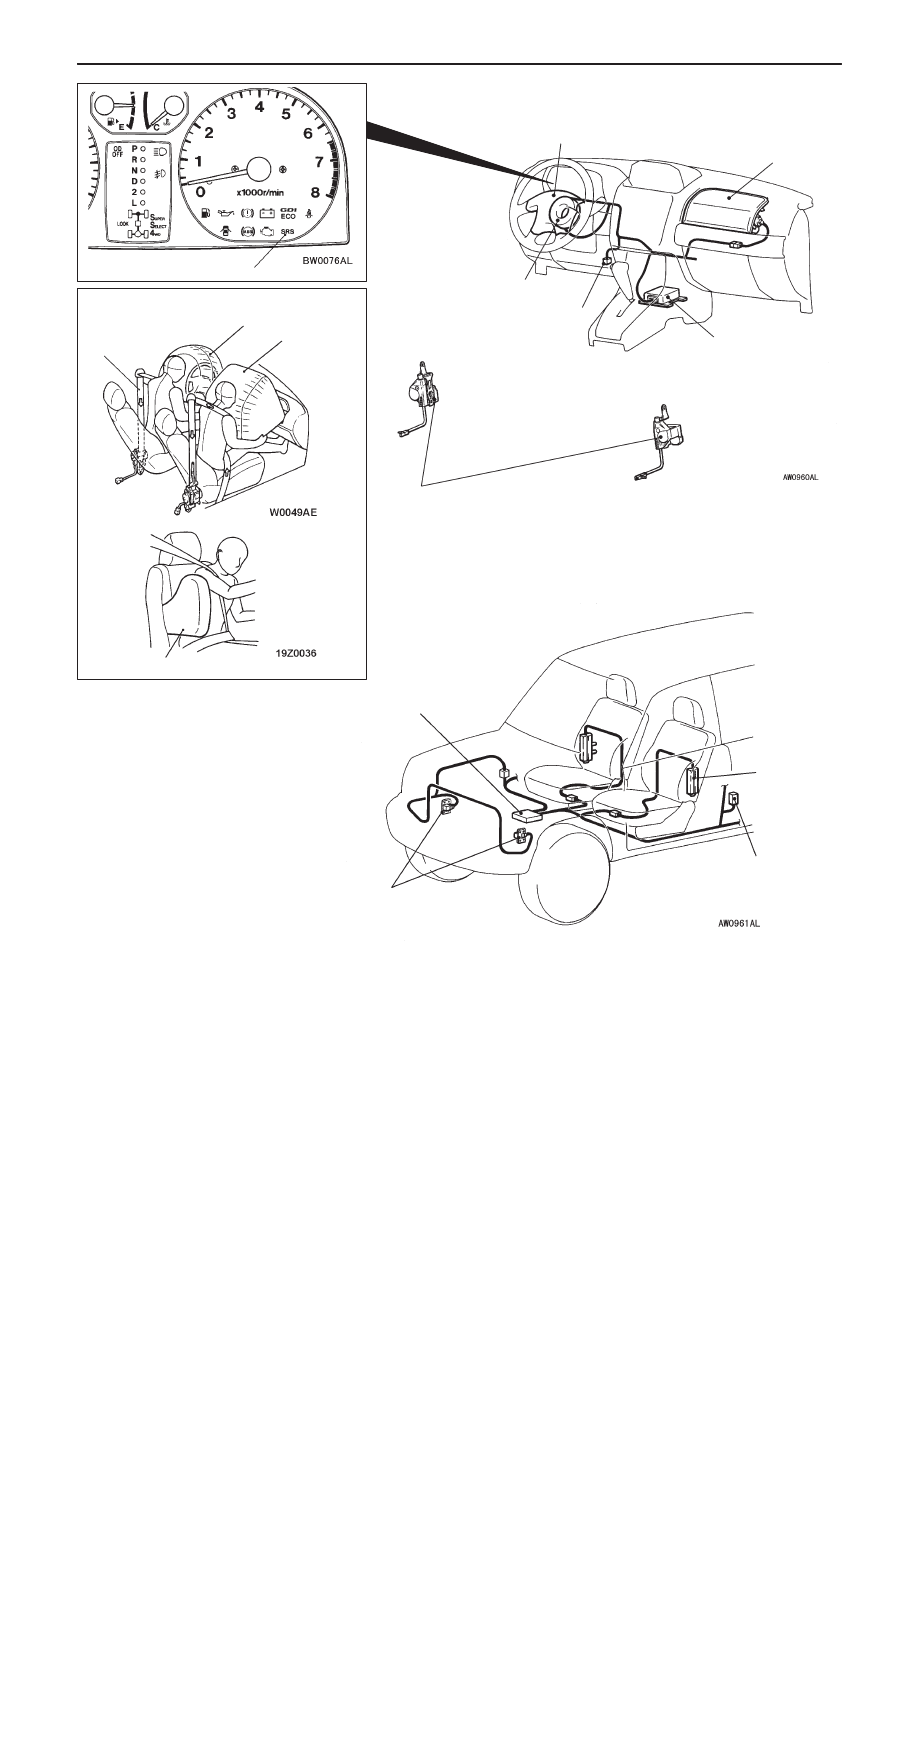 mitsubishi pajero pinin manual part 306 rh zinref ru Chilton Manuals 02 Mazda Protege5 Repair Manuals